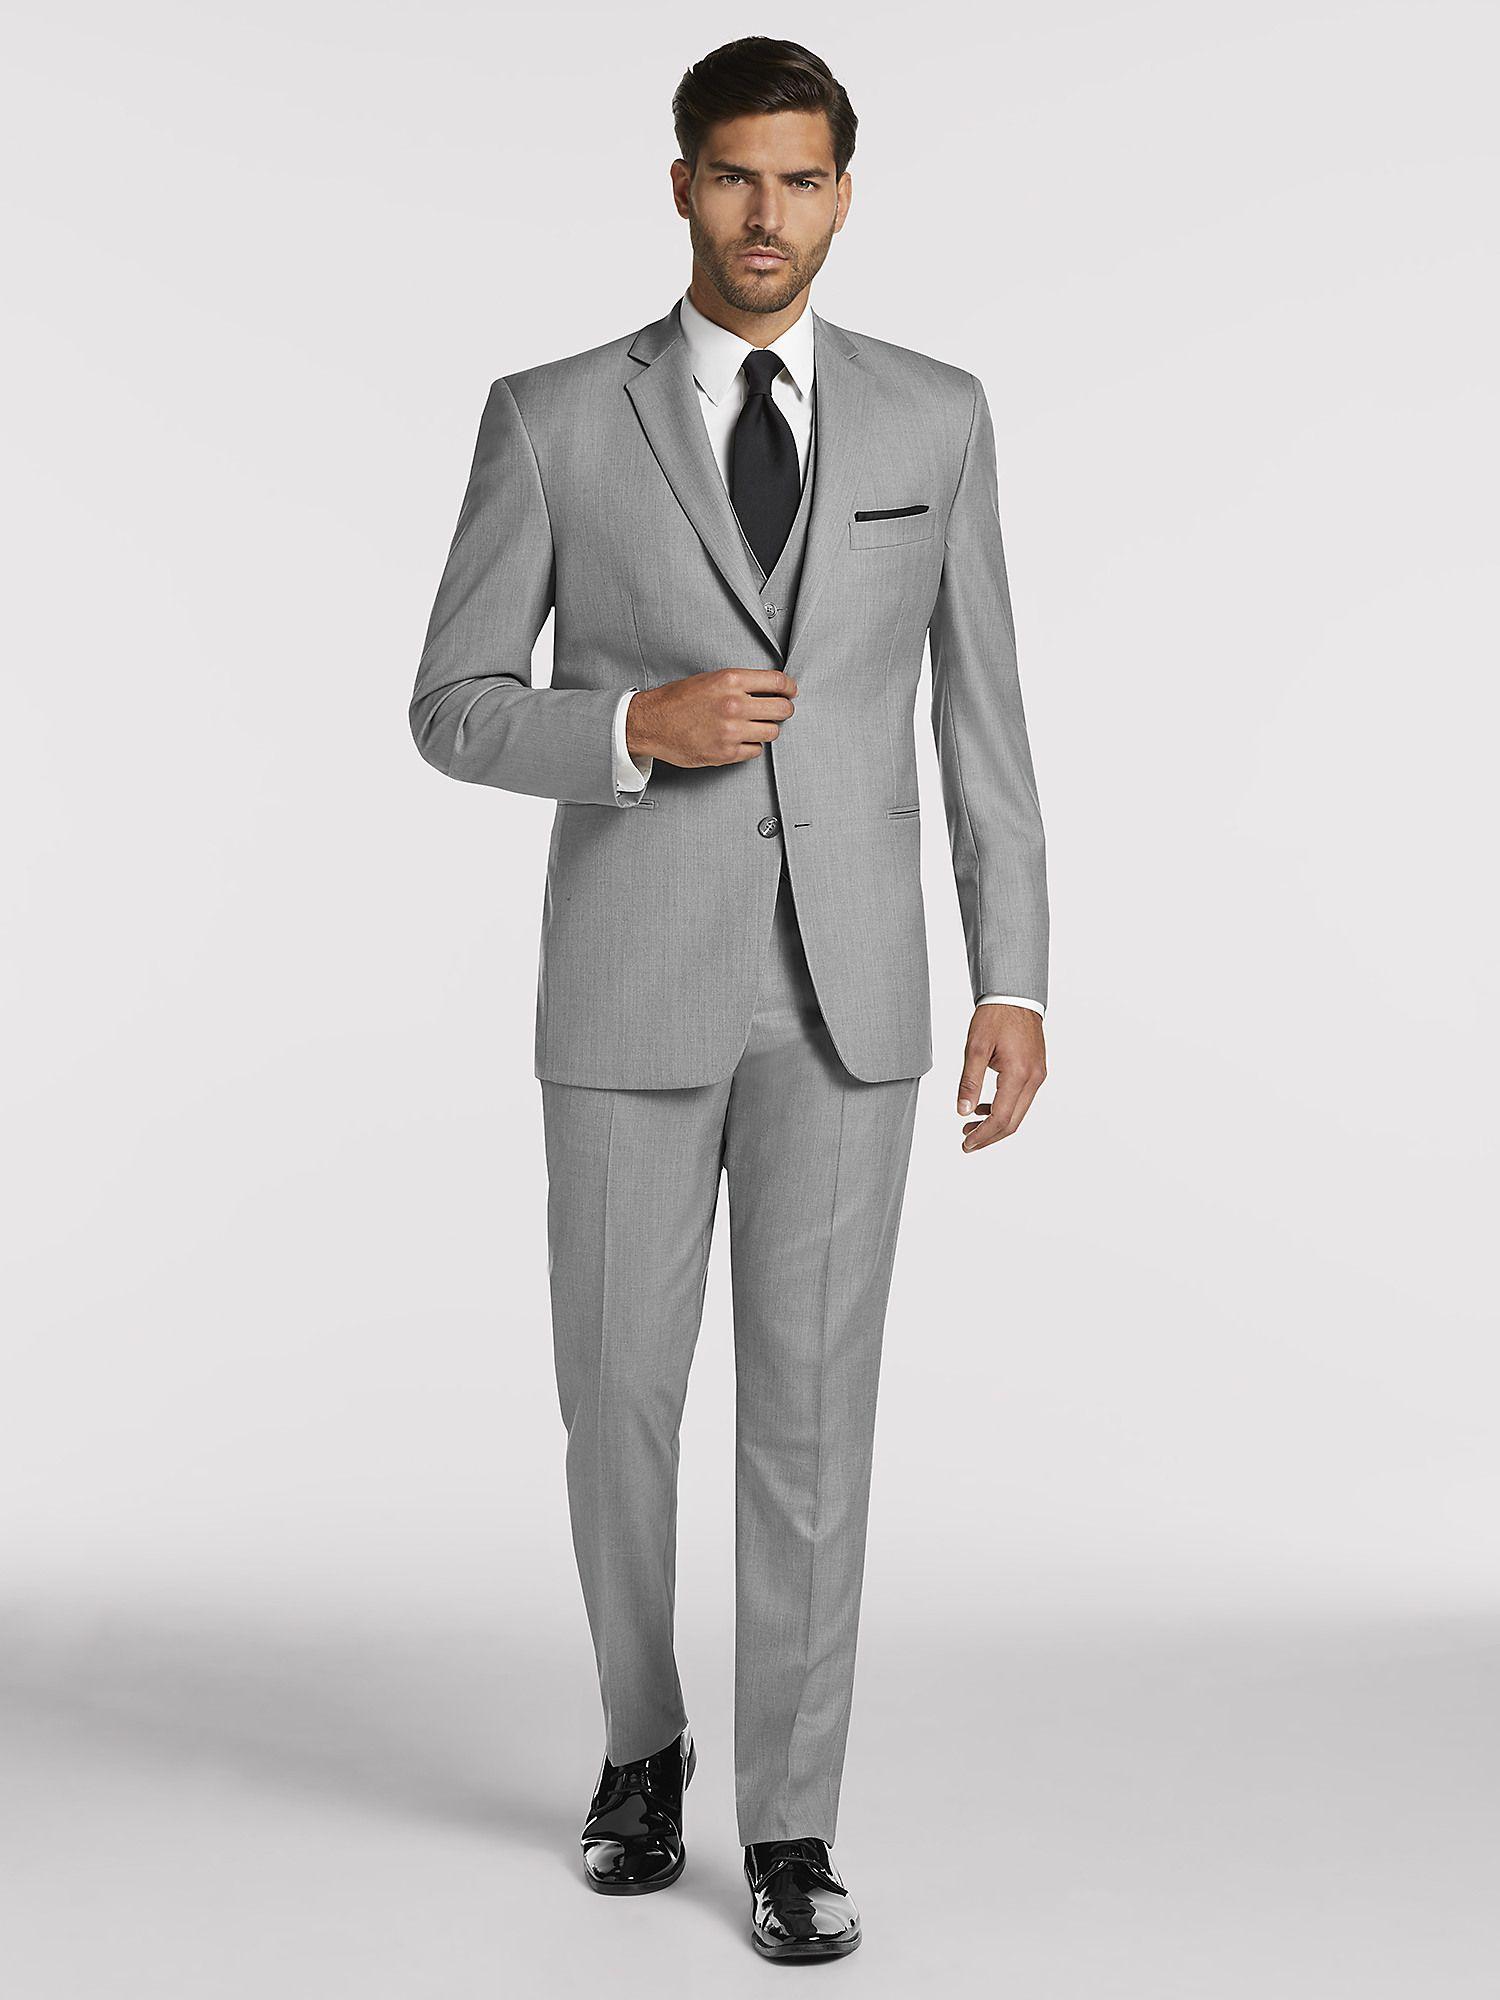 Vintage Men's Grey Suit by Pronto Uomo Suit Rental